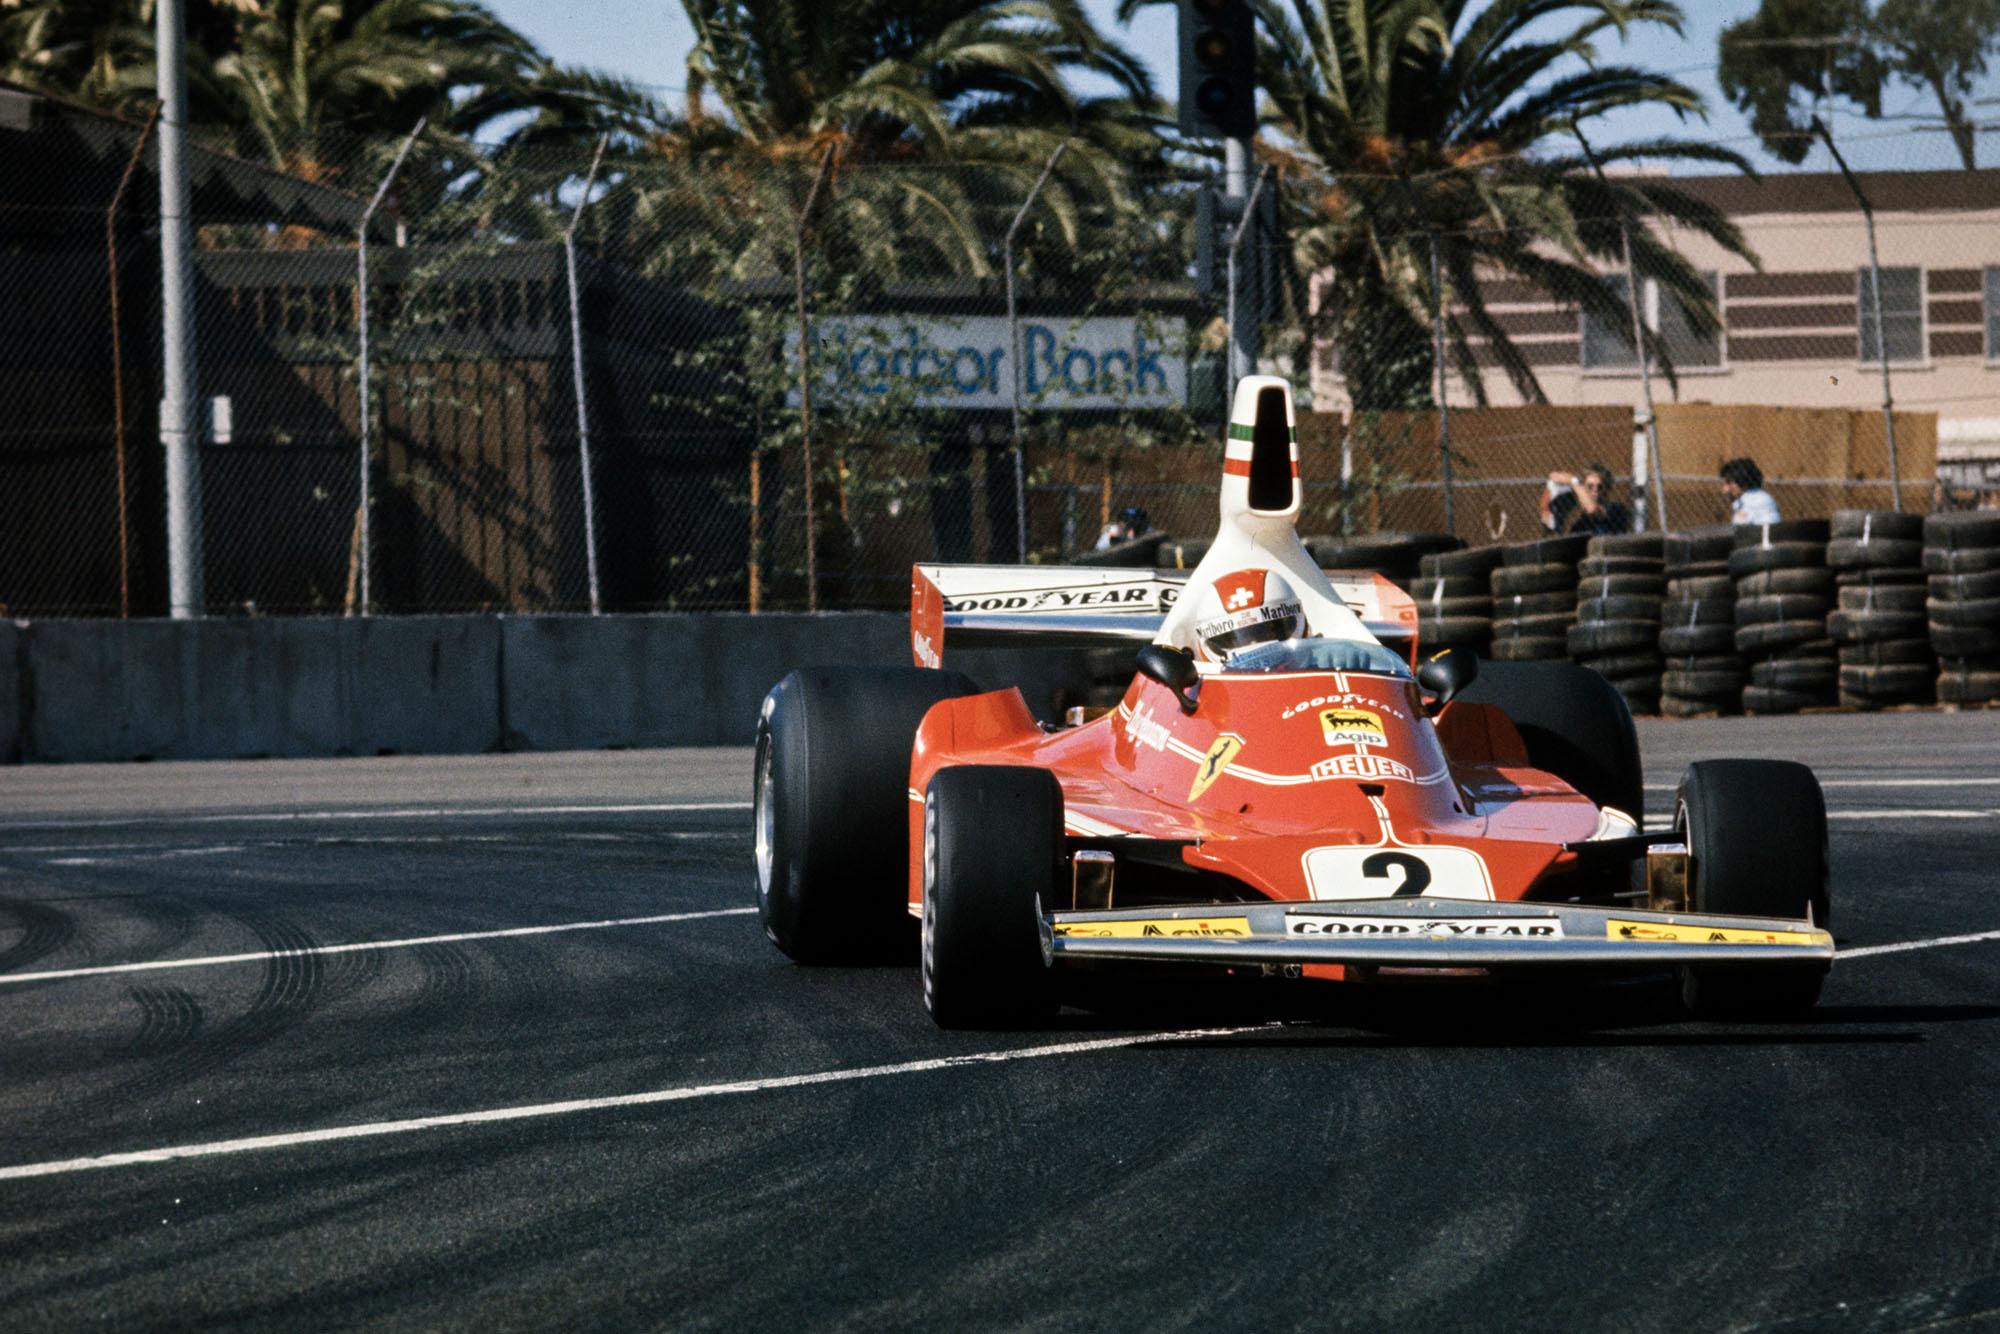 Clay Regazzoni (Ferrari), 1976 United States Grand Prix West,